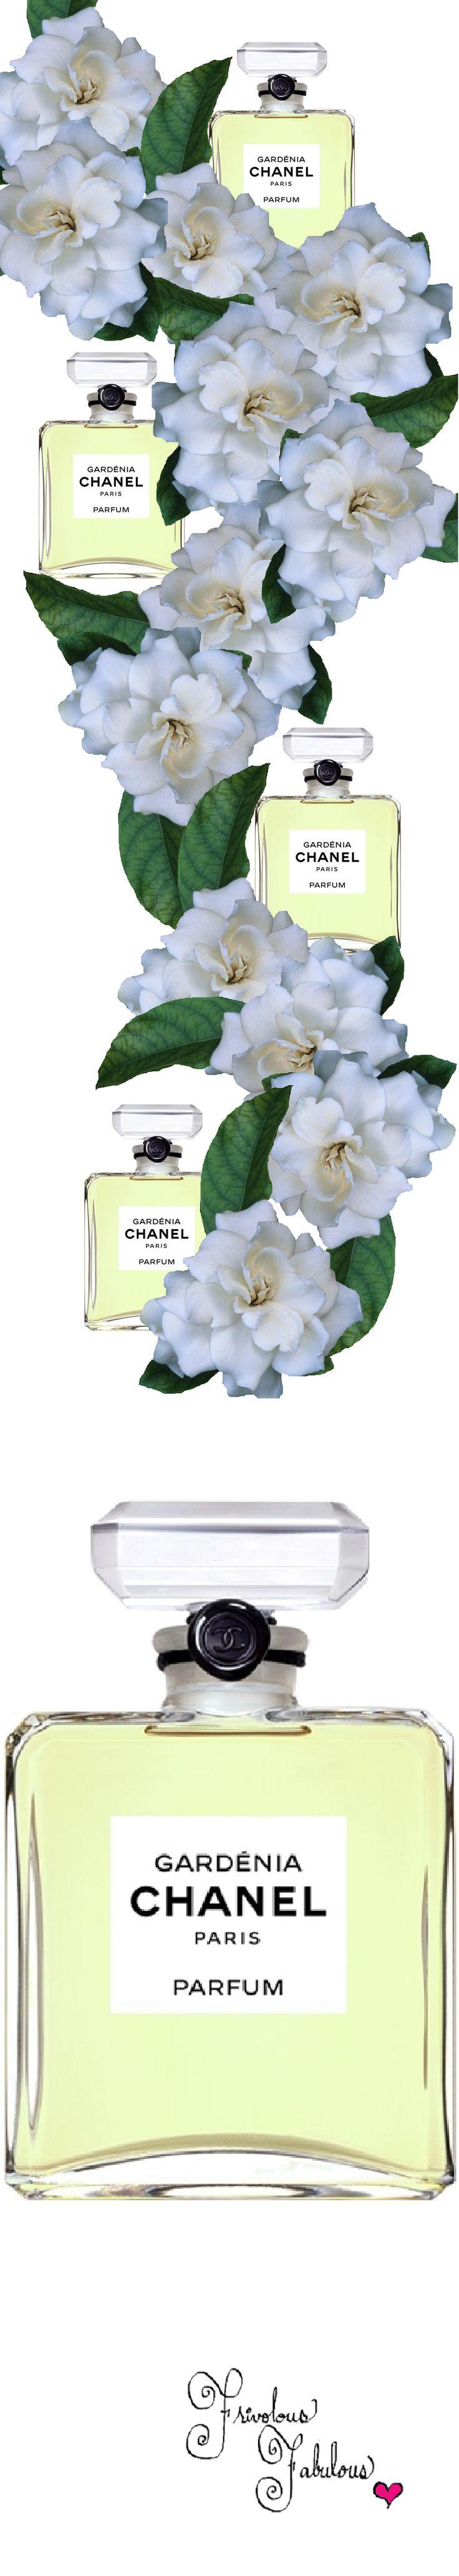 Chanel GARDÉNIA PARFUM   House of Beccaria# V